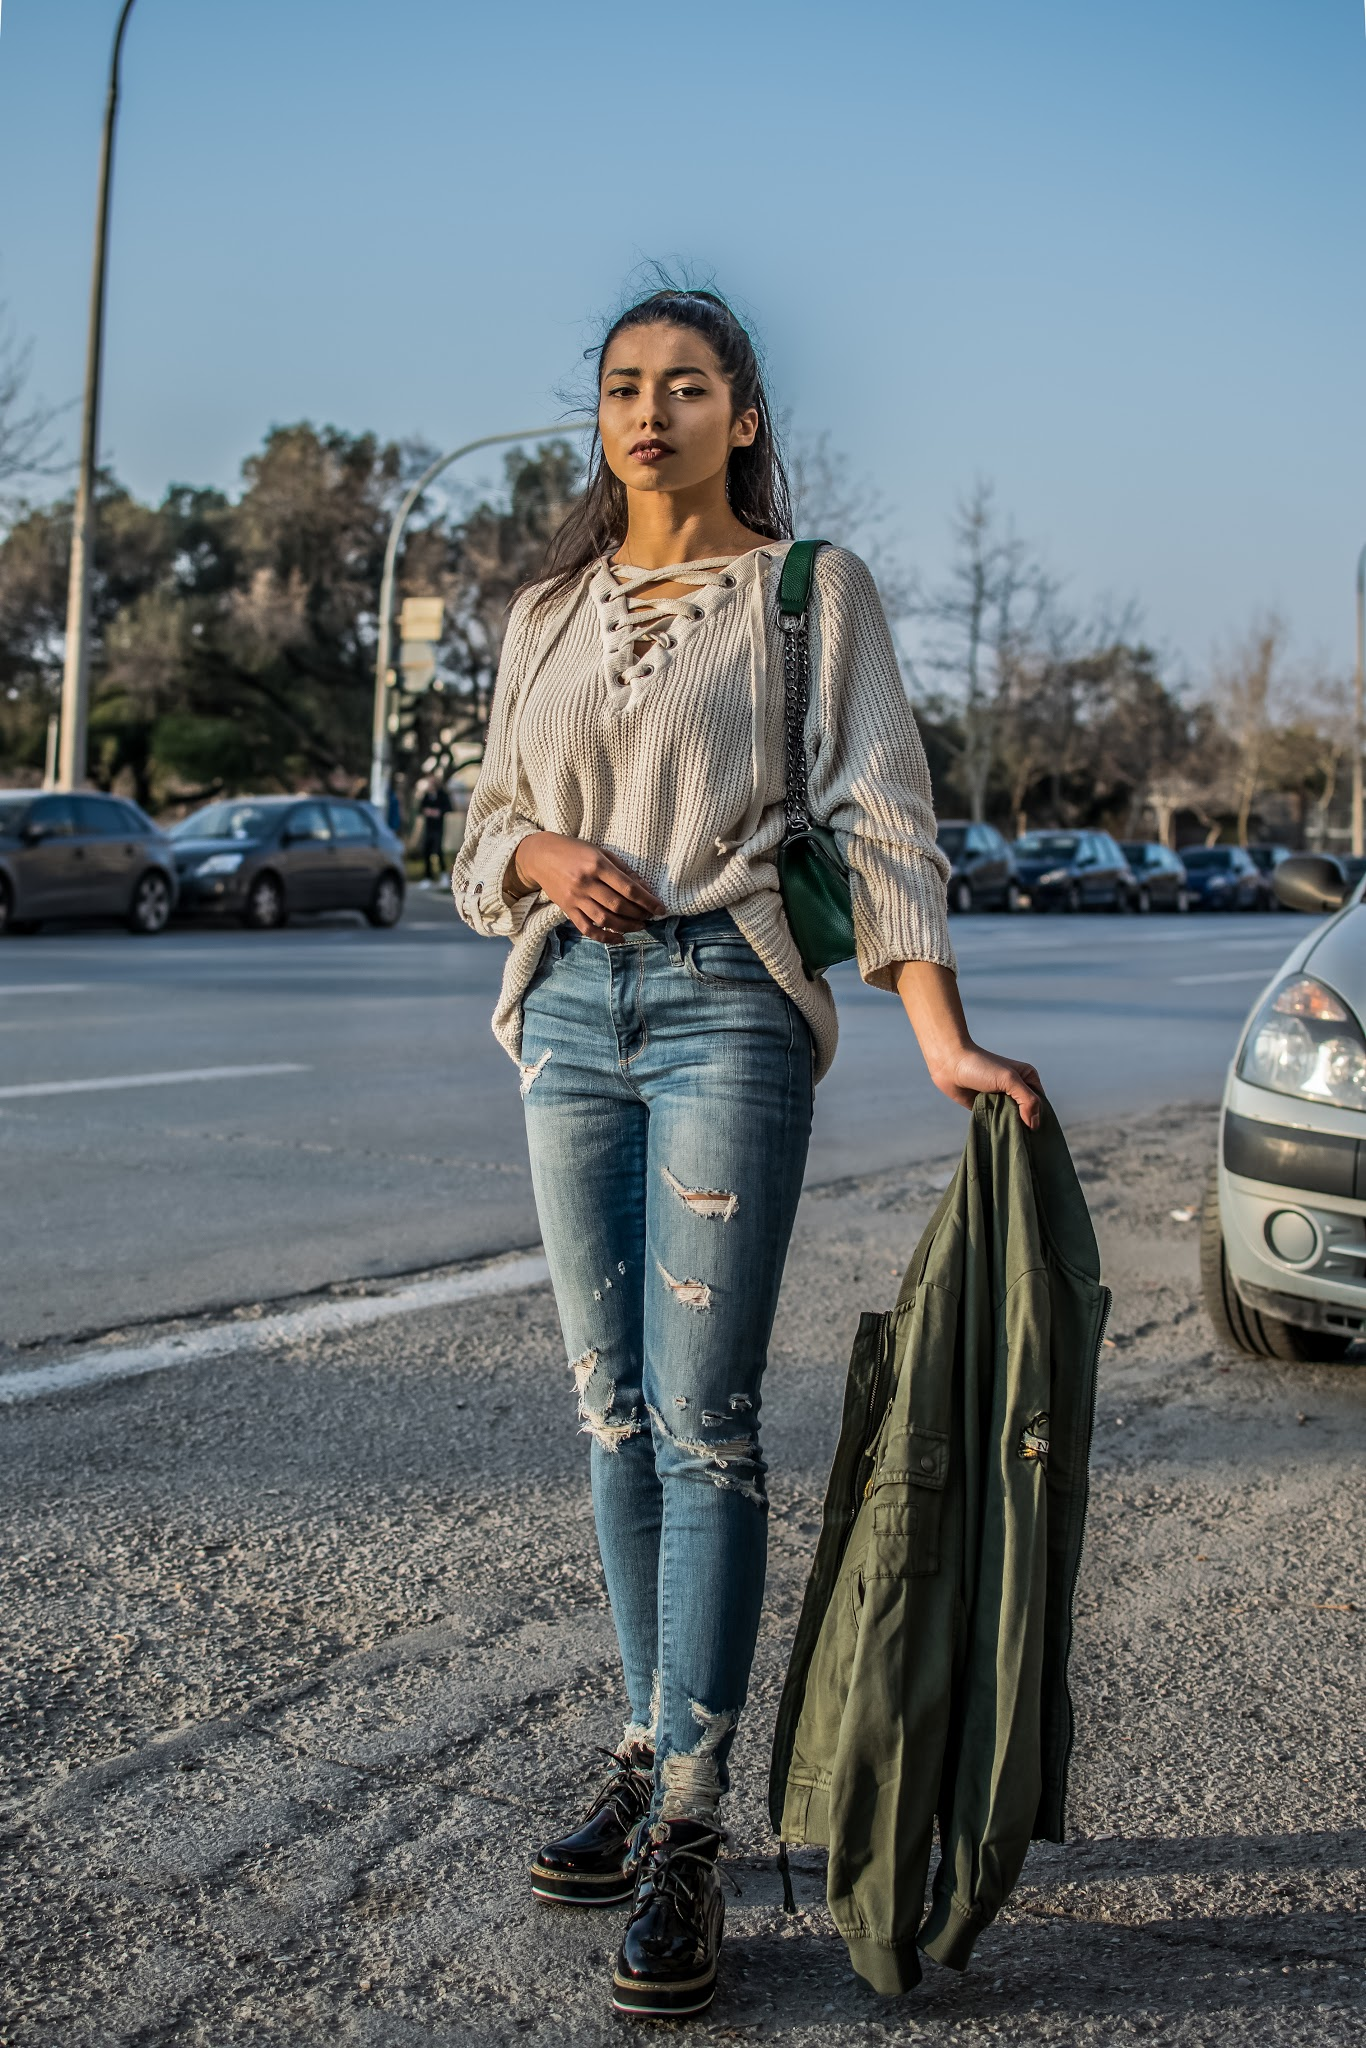 fashion blogging, is it worth it?